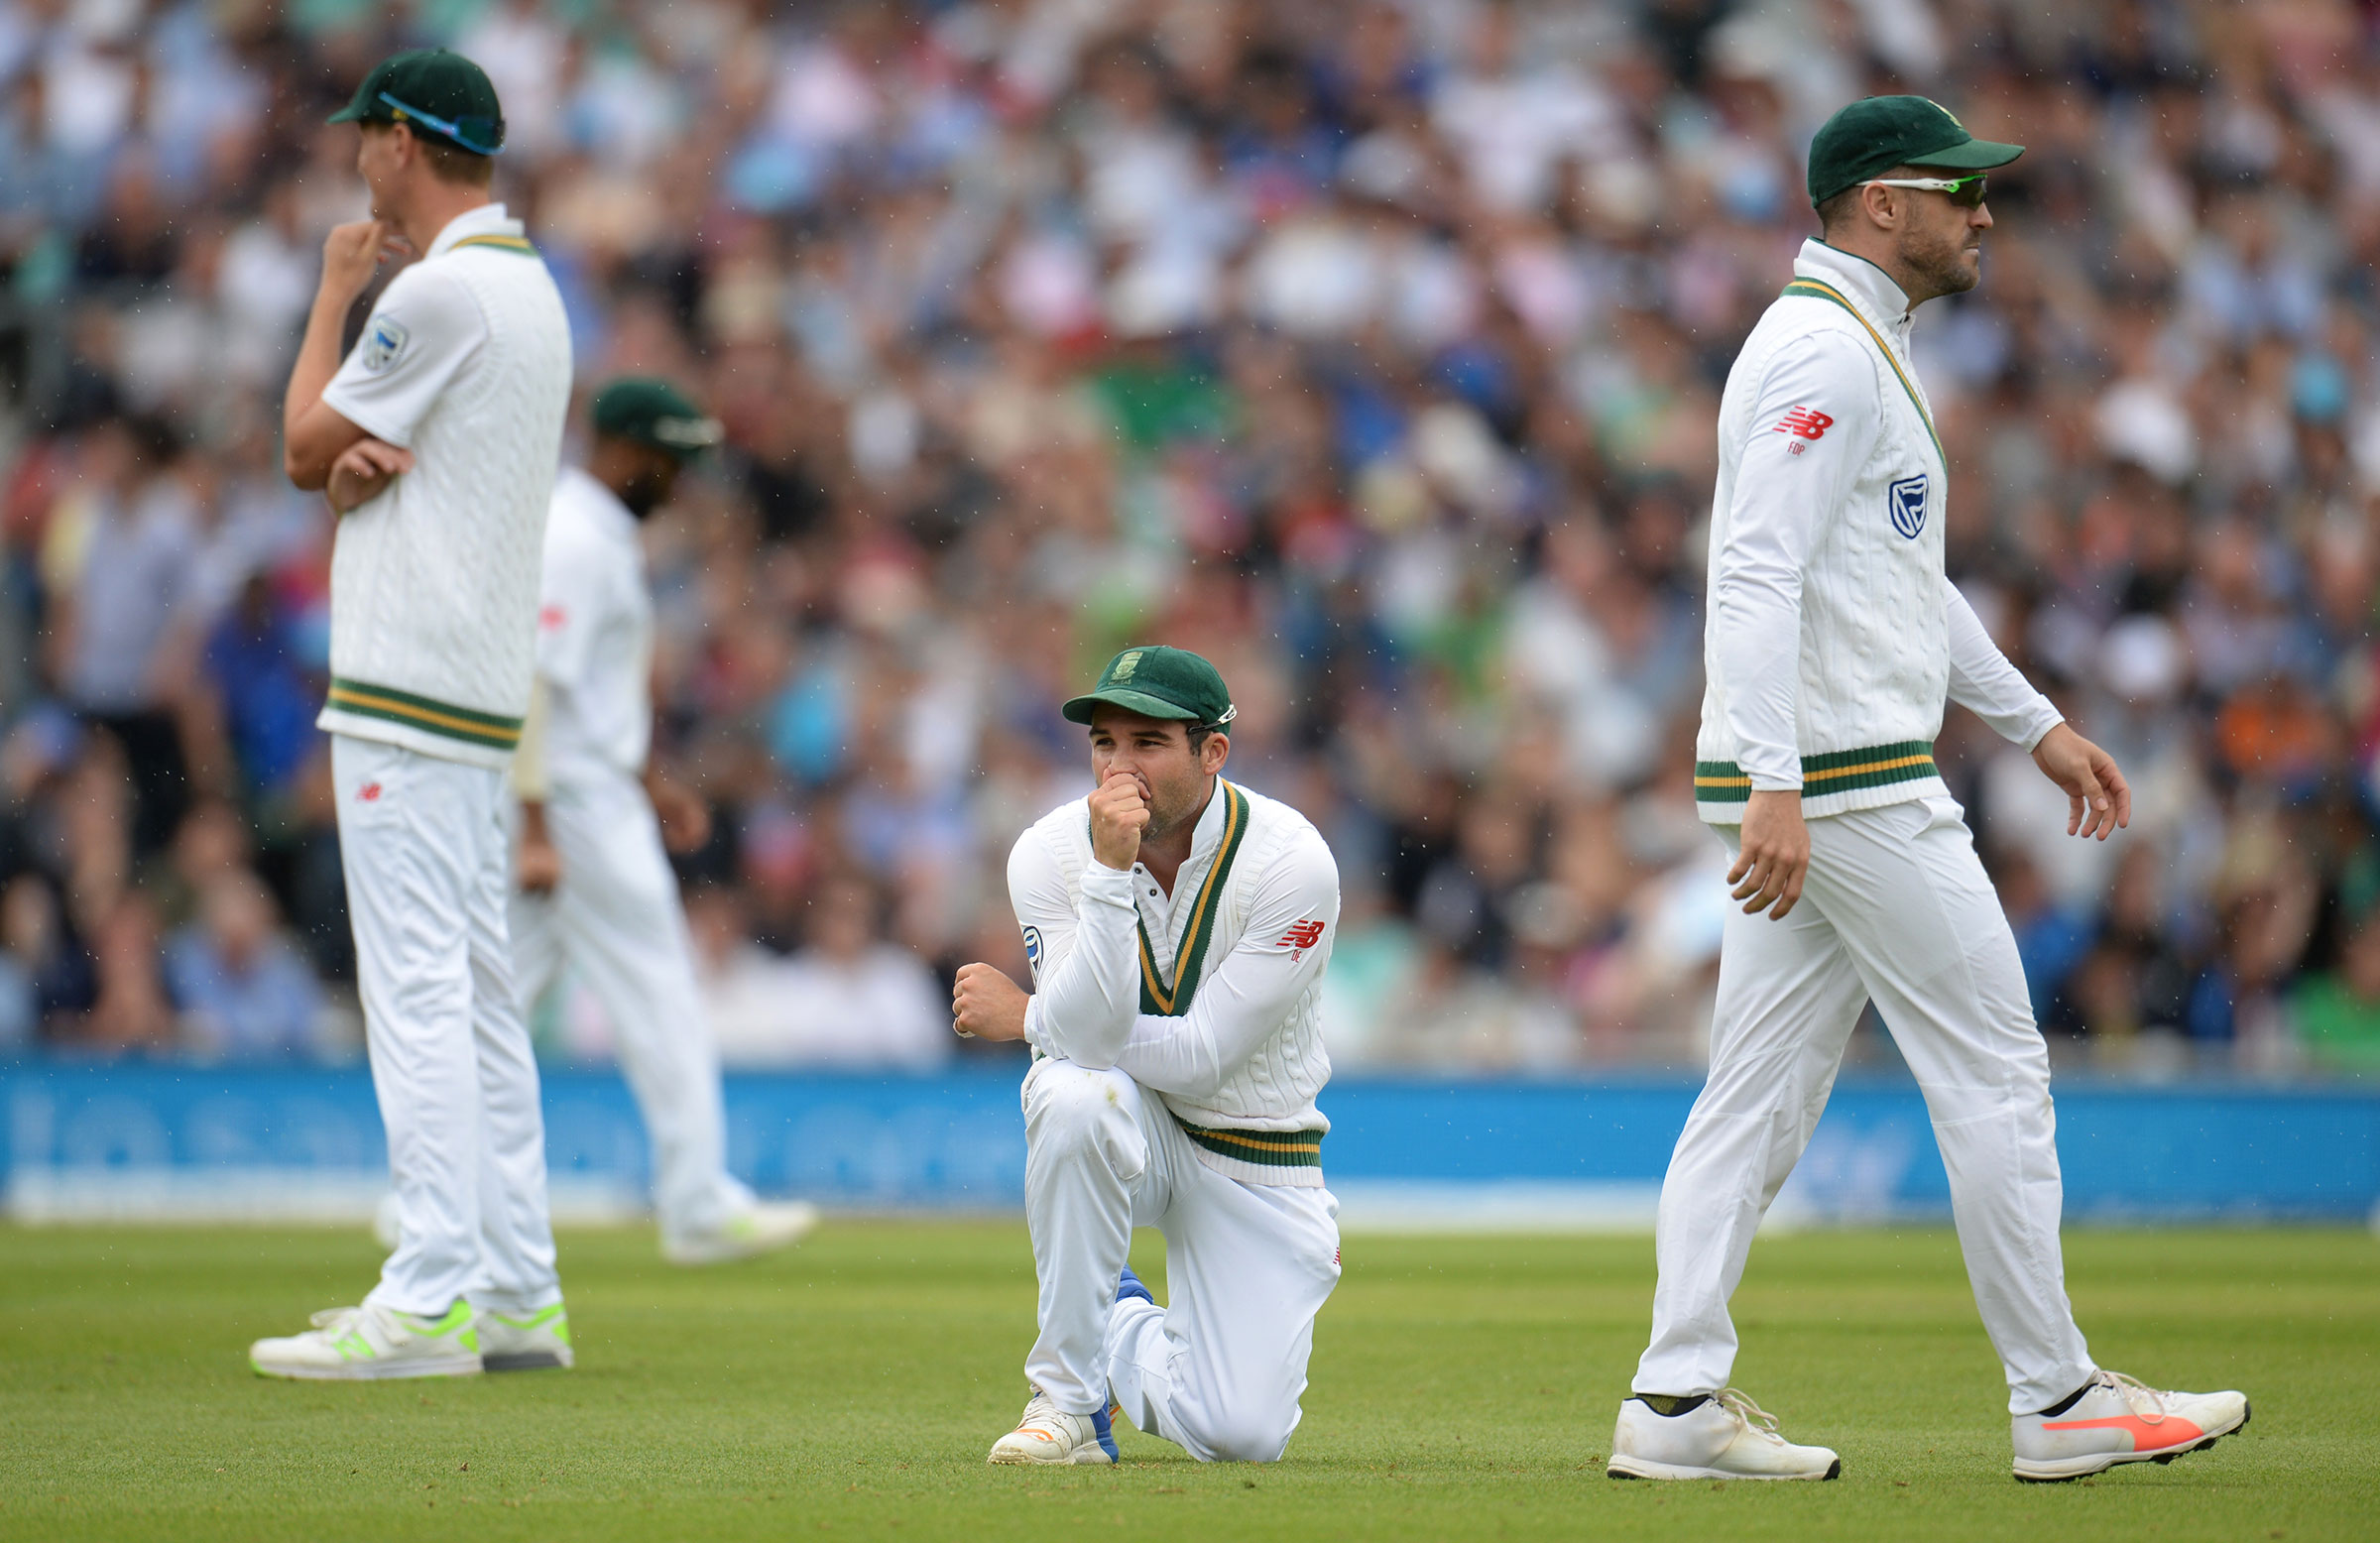 Elgar ponders letting Jennings off the hook // Getty Images